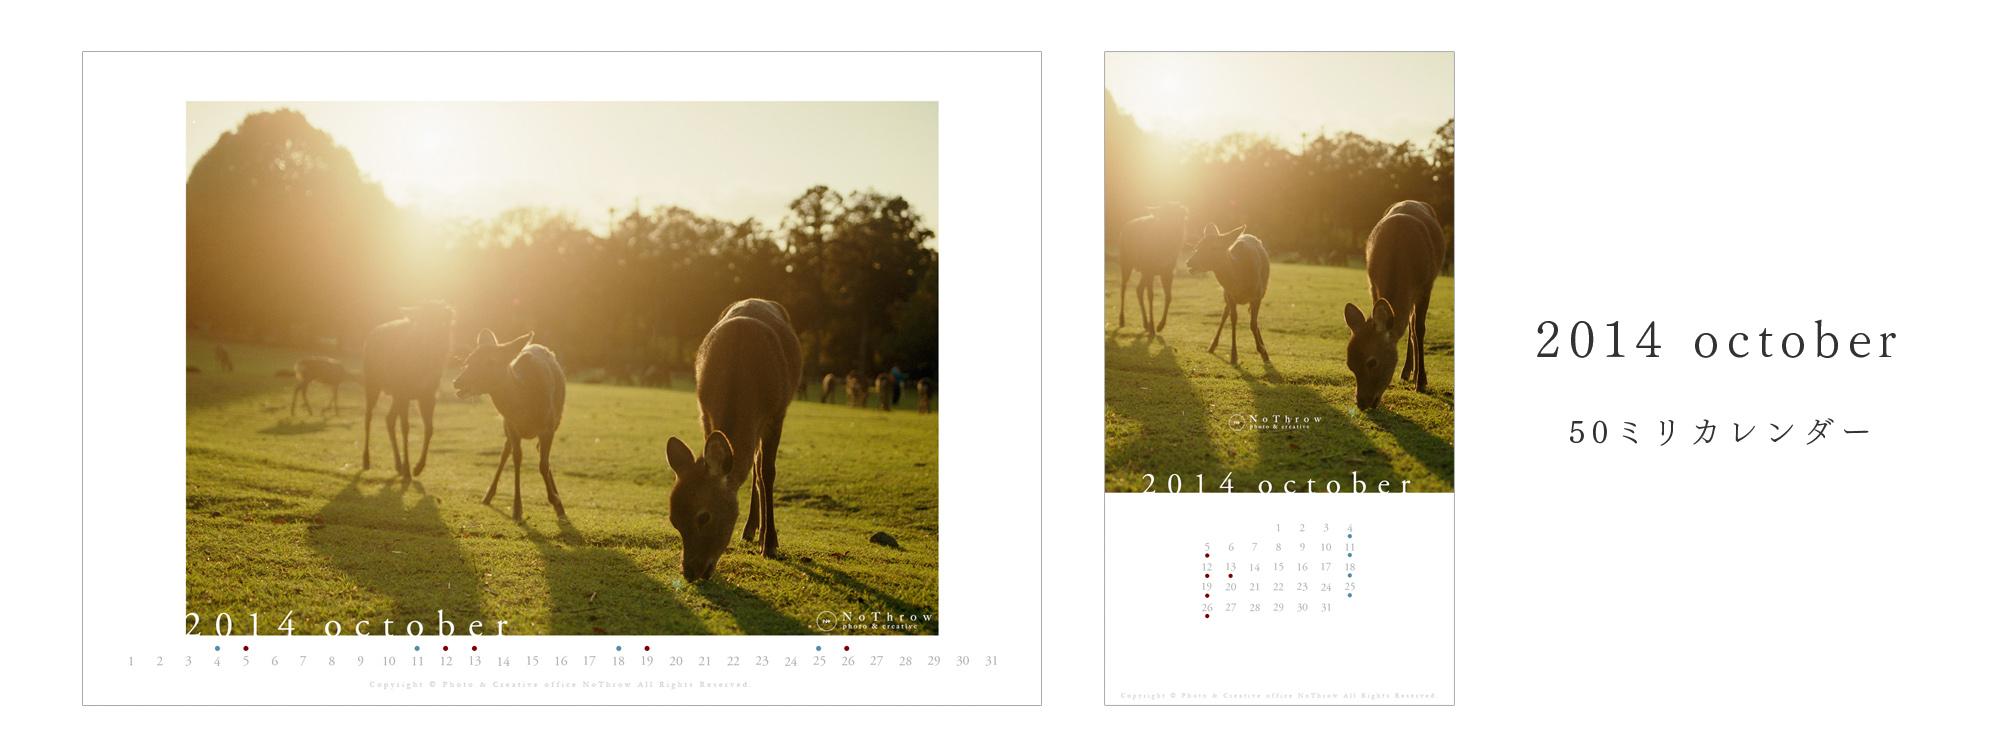 201410_calendar